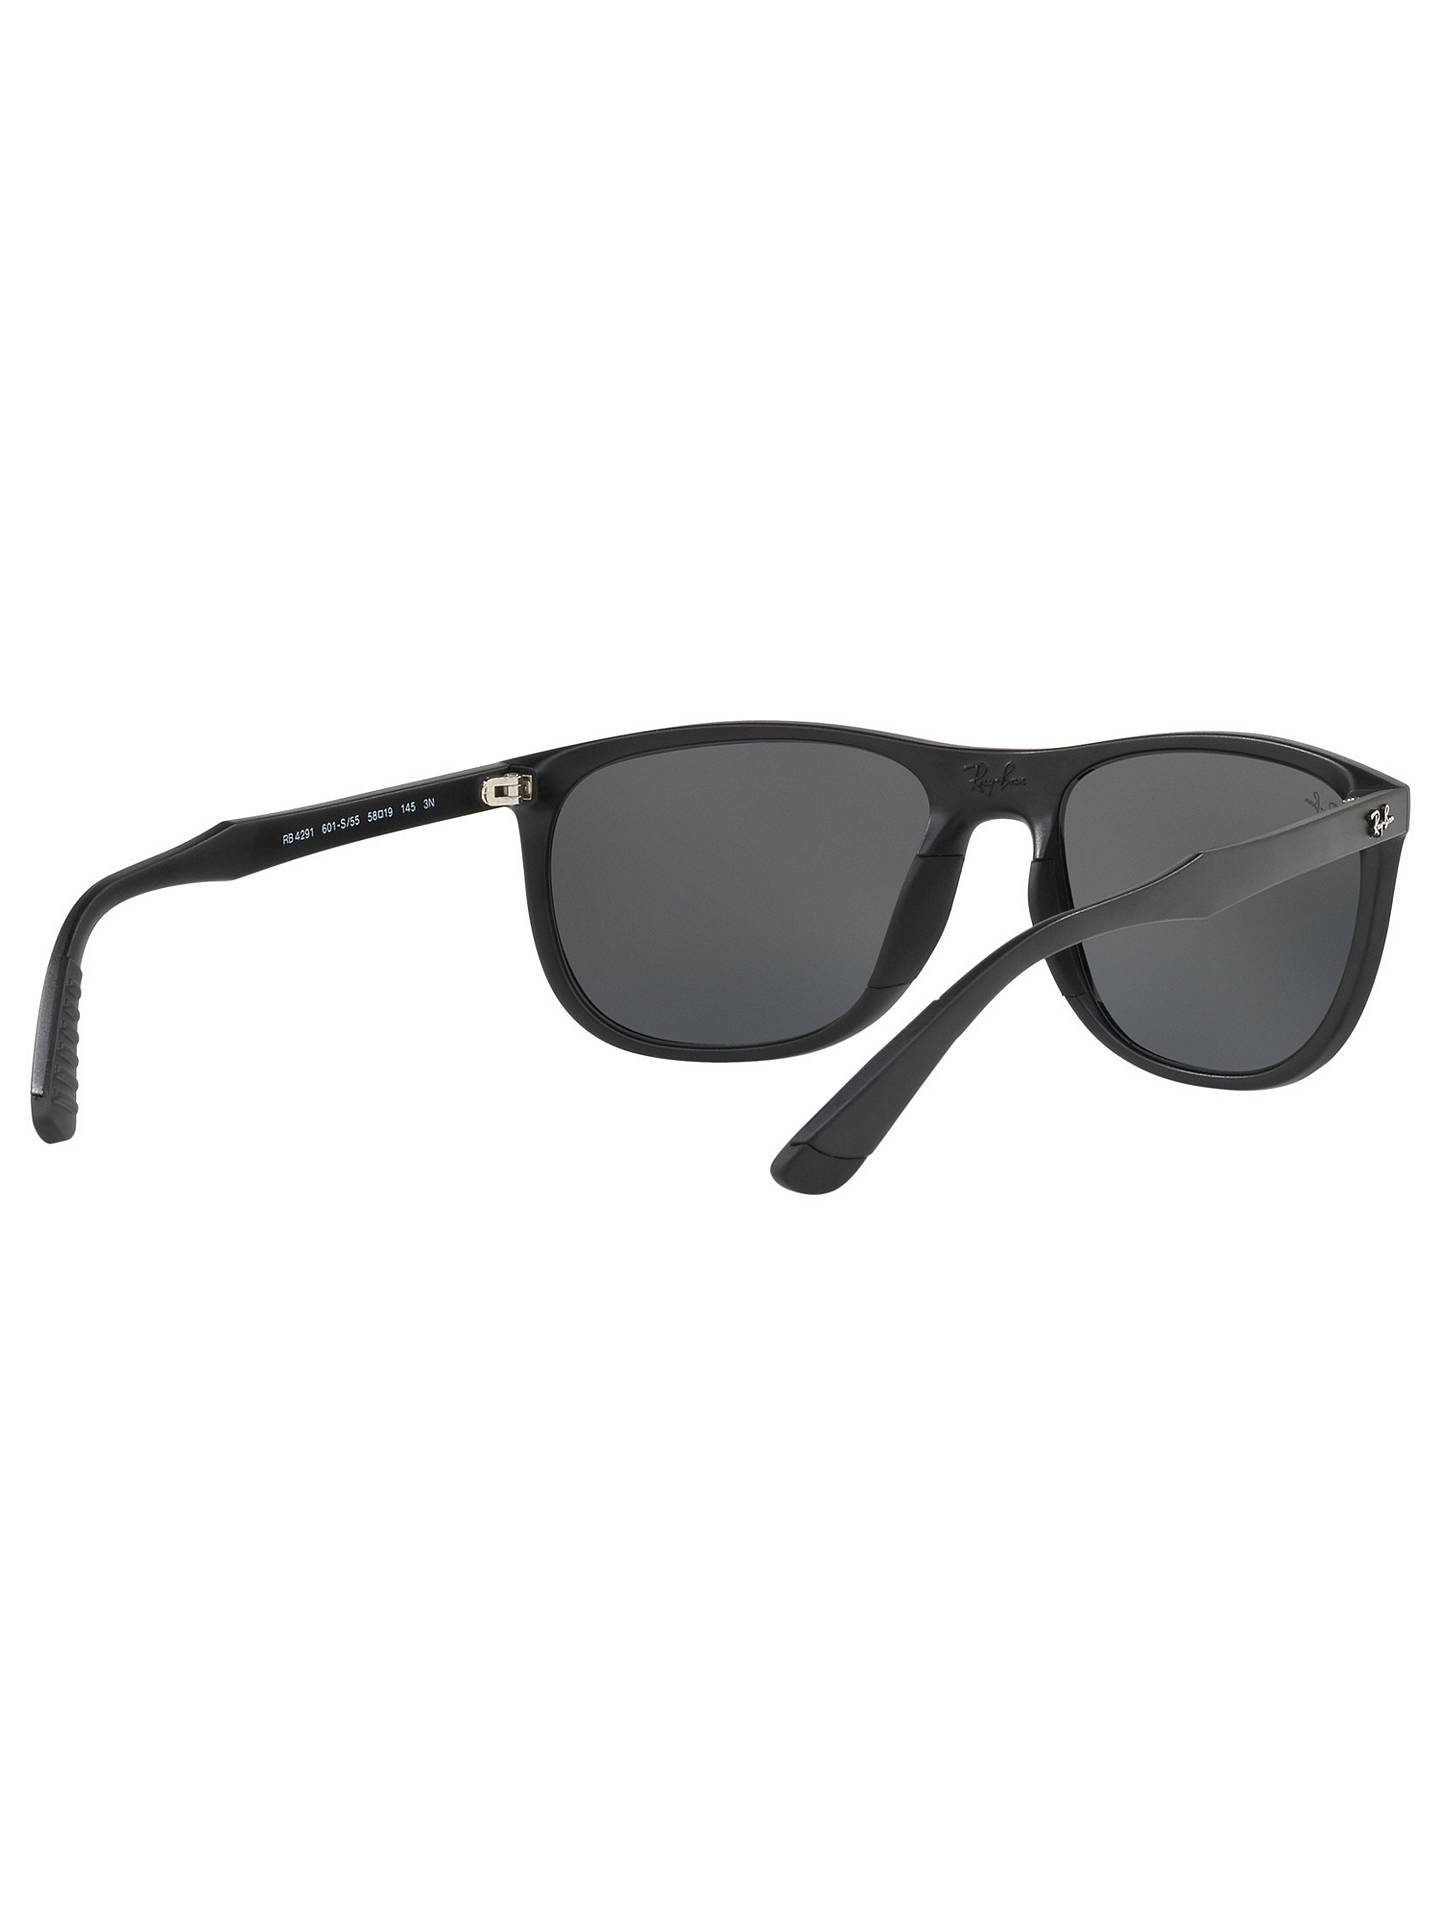 ed0f750cfc Ray-Ban RB4291 Square Sunglasses at John Lewis   Partners